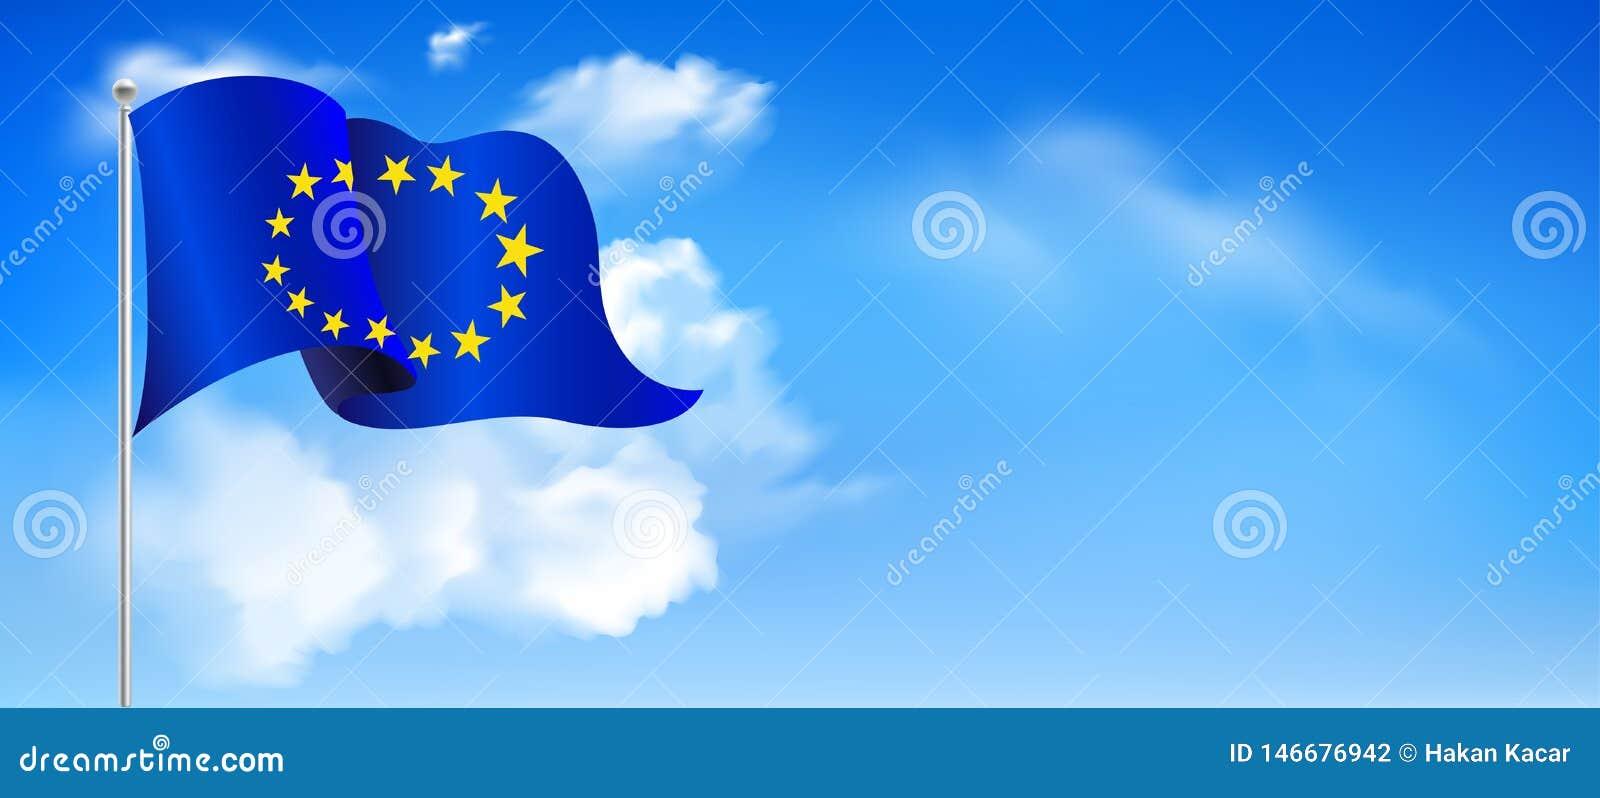 D?a de Europa D?a festivo anual en mayo